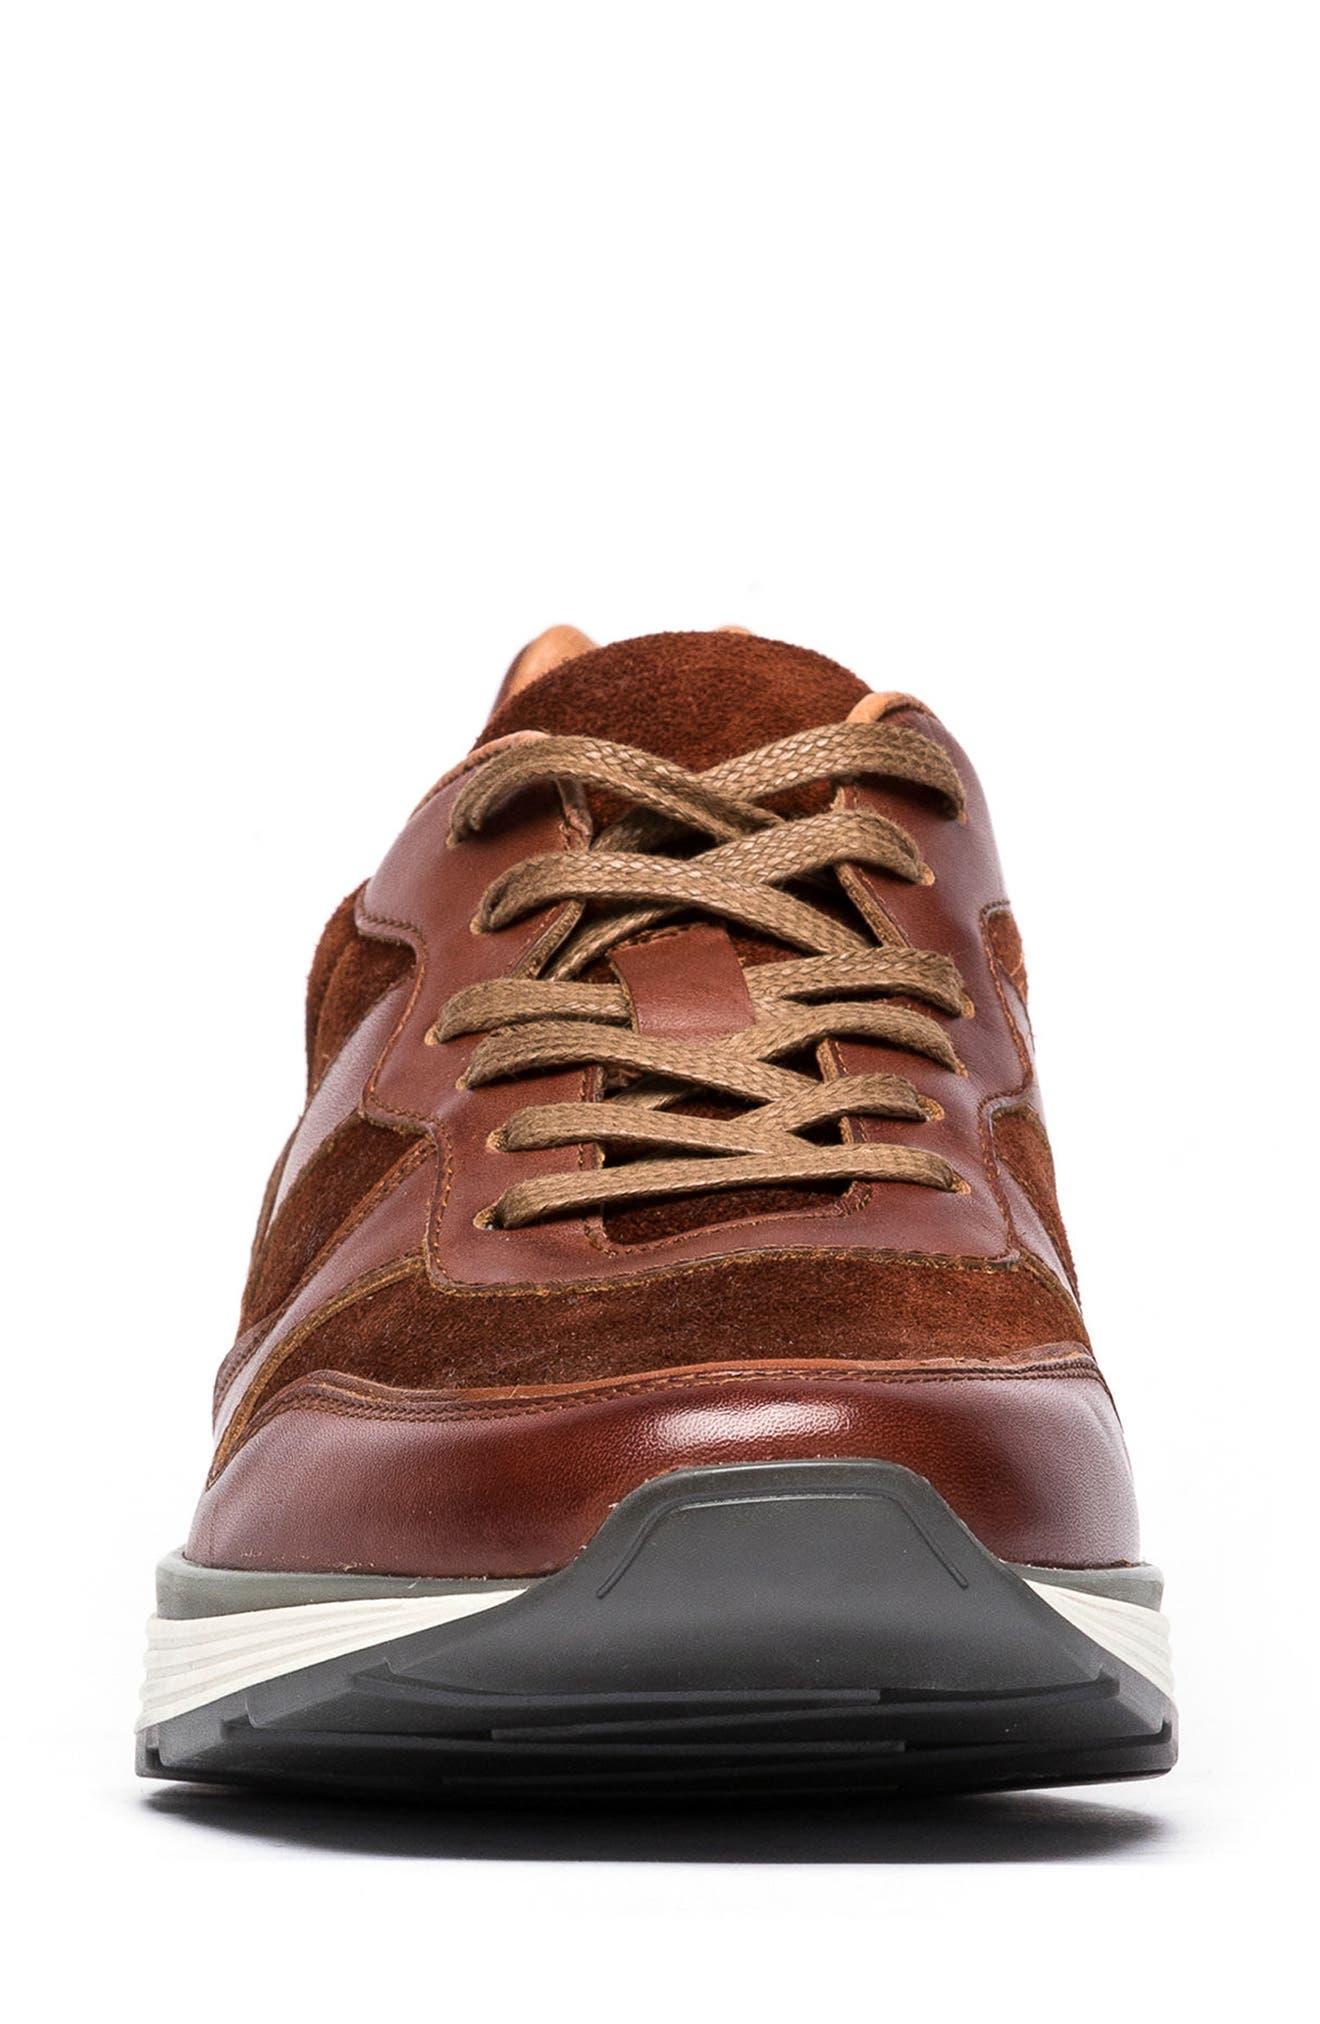 Hickory Sneaker,                             Alternate thumbnail 4, color,                             208